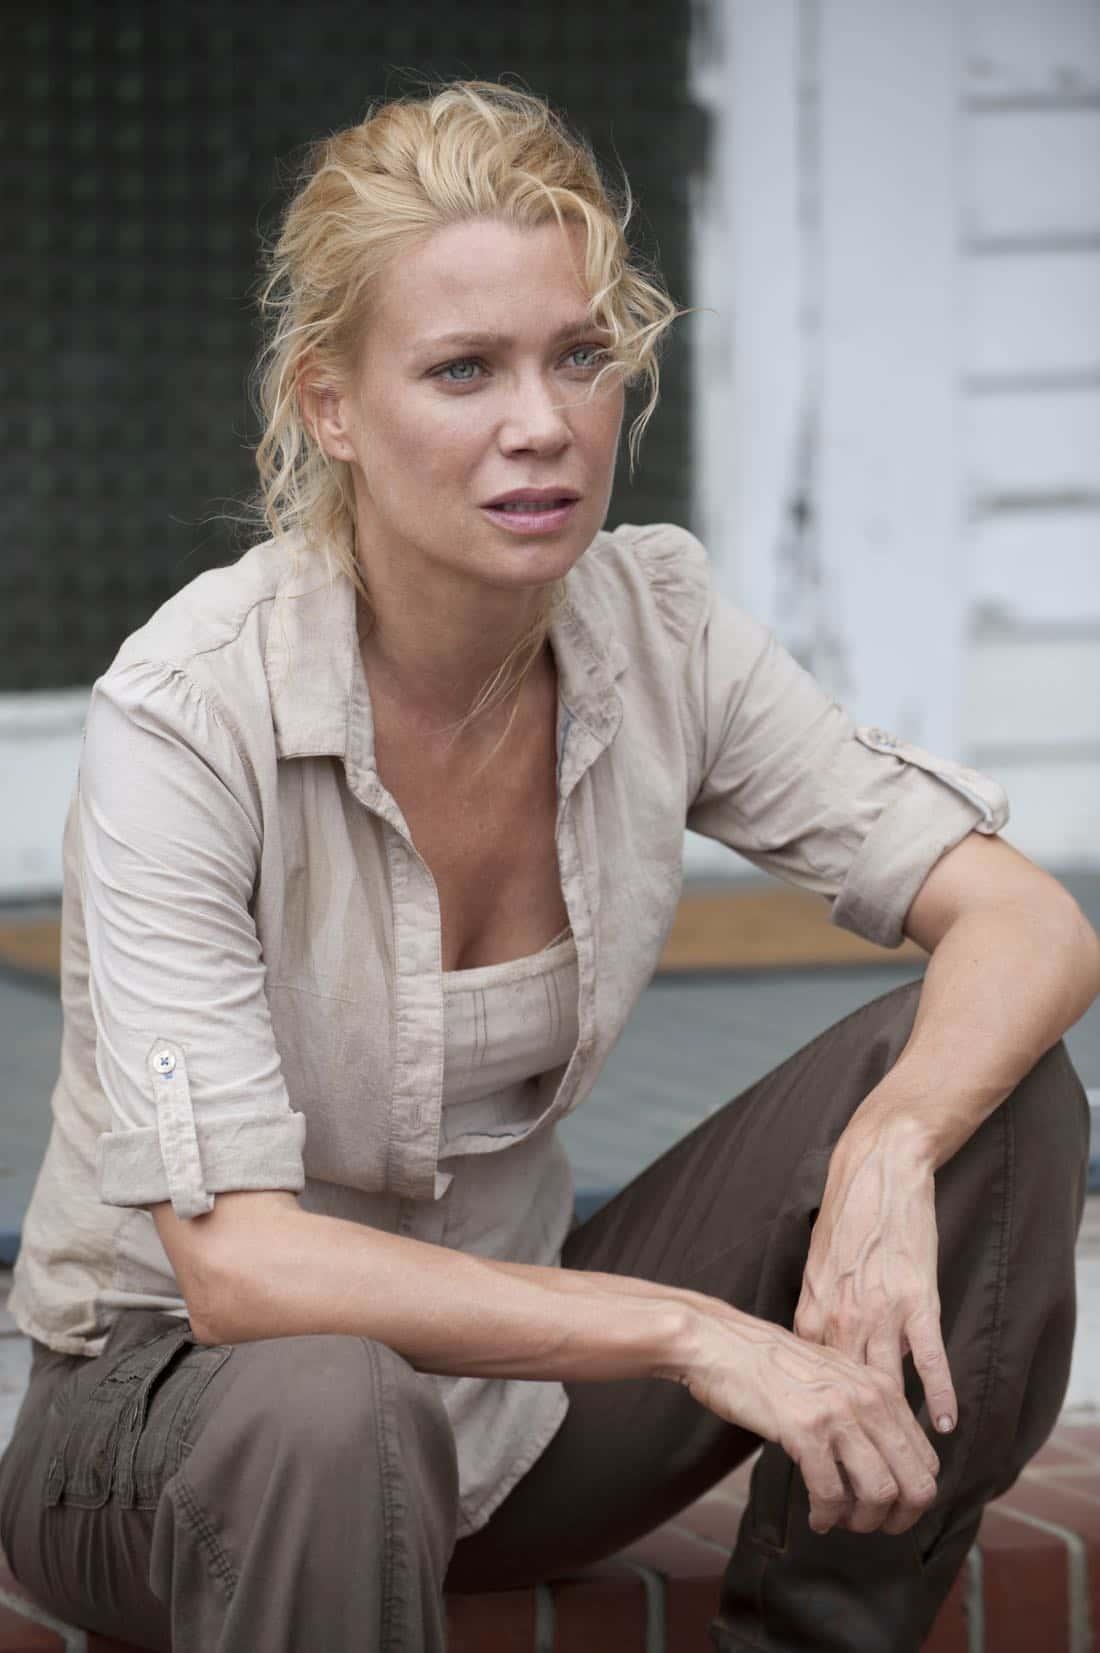 Andrea (Laurie Holden) - The Walking Dead - Season 2, Episode 5